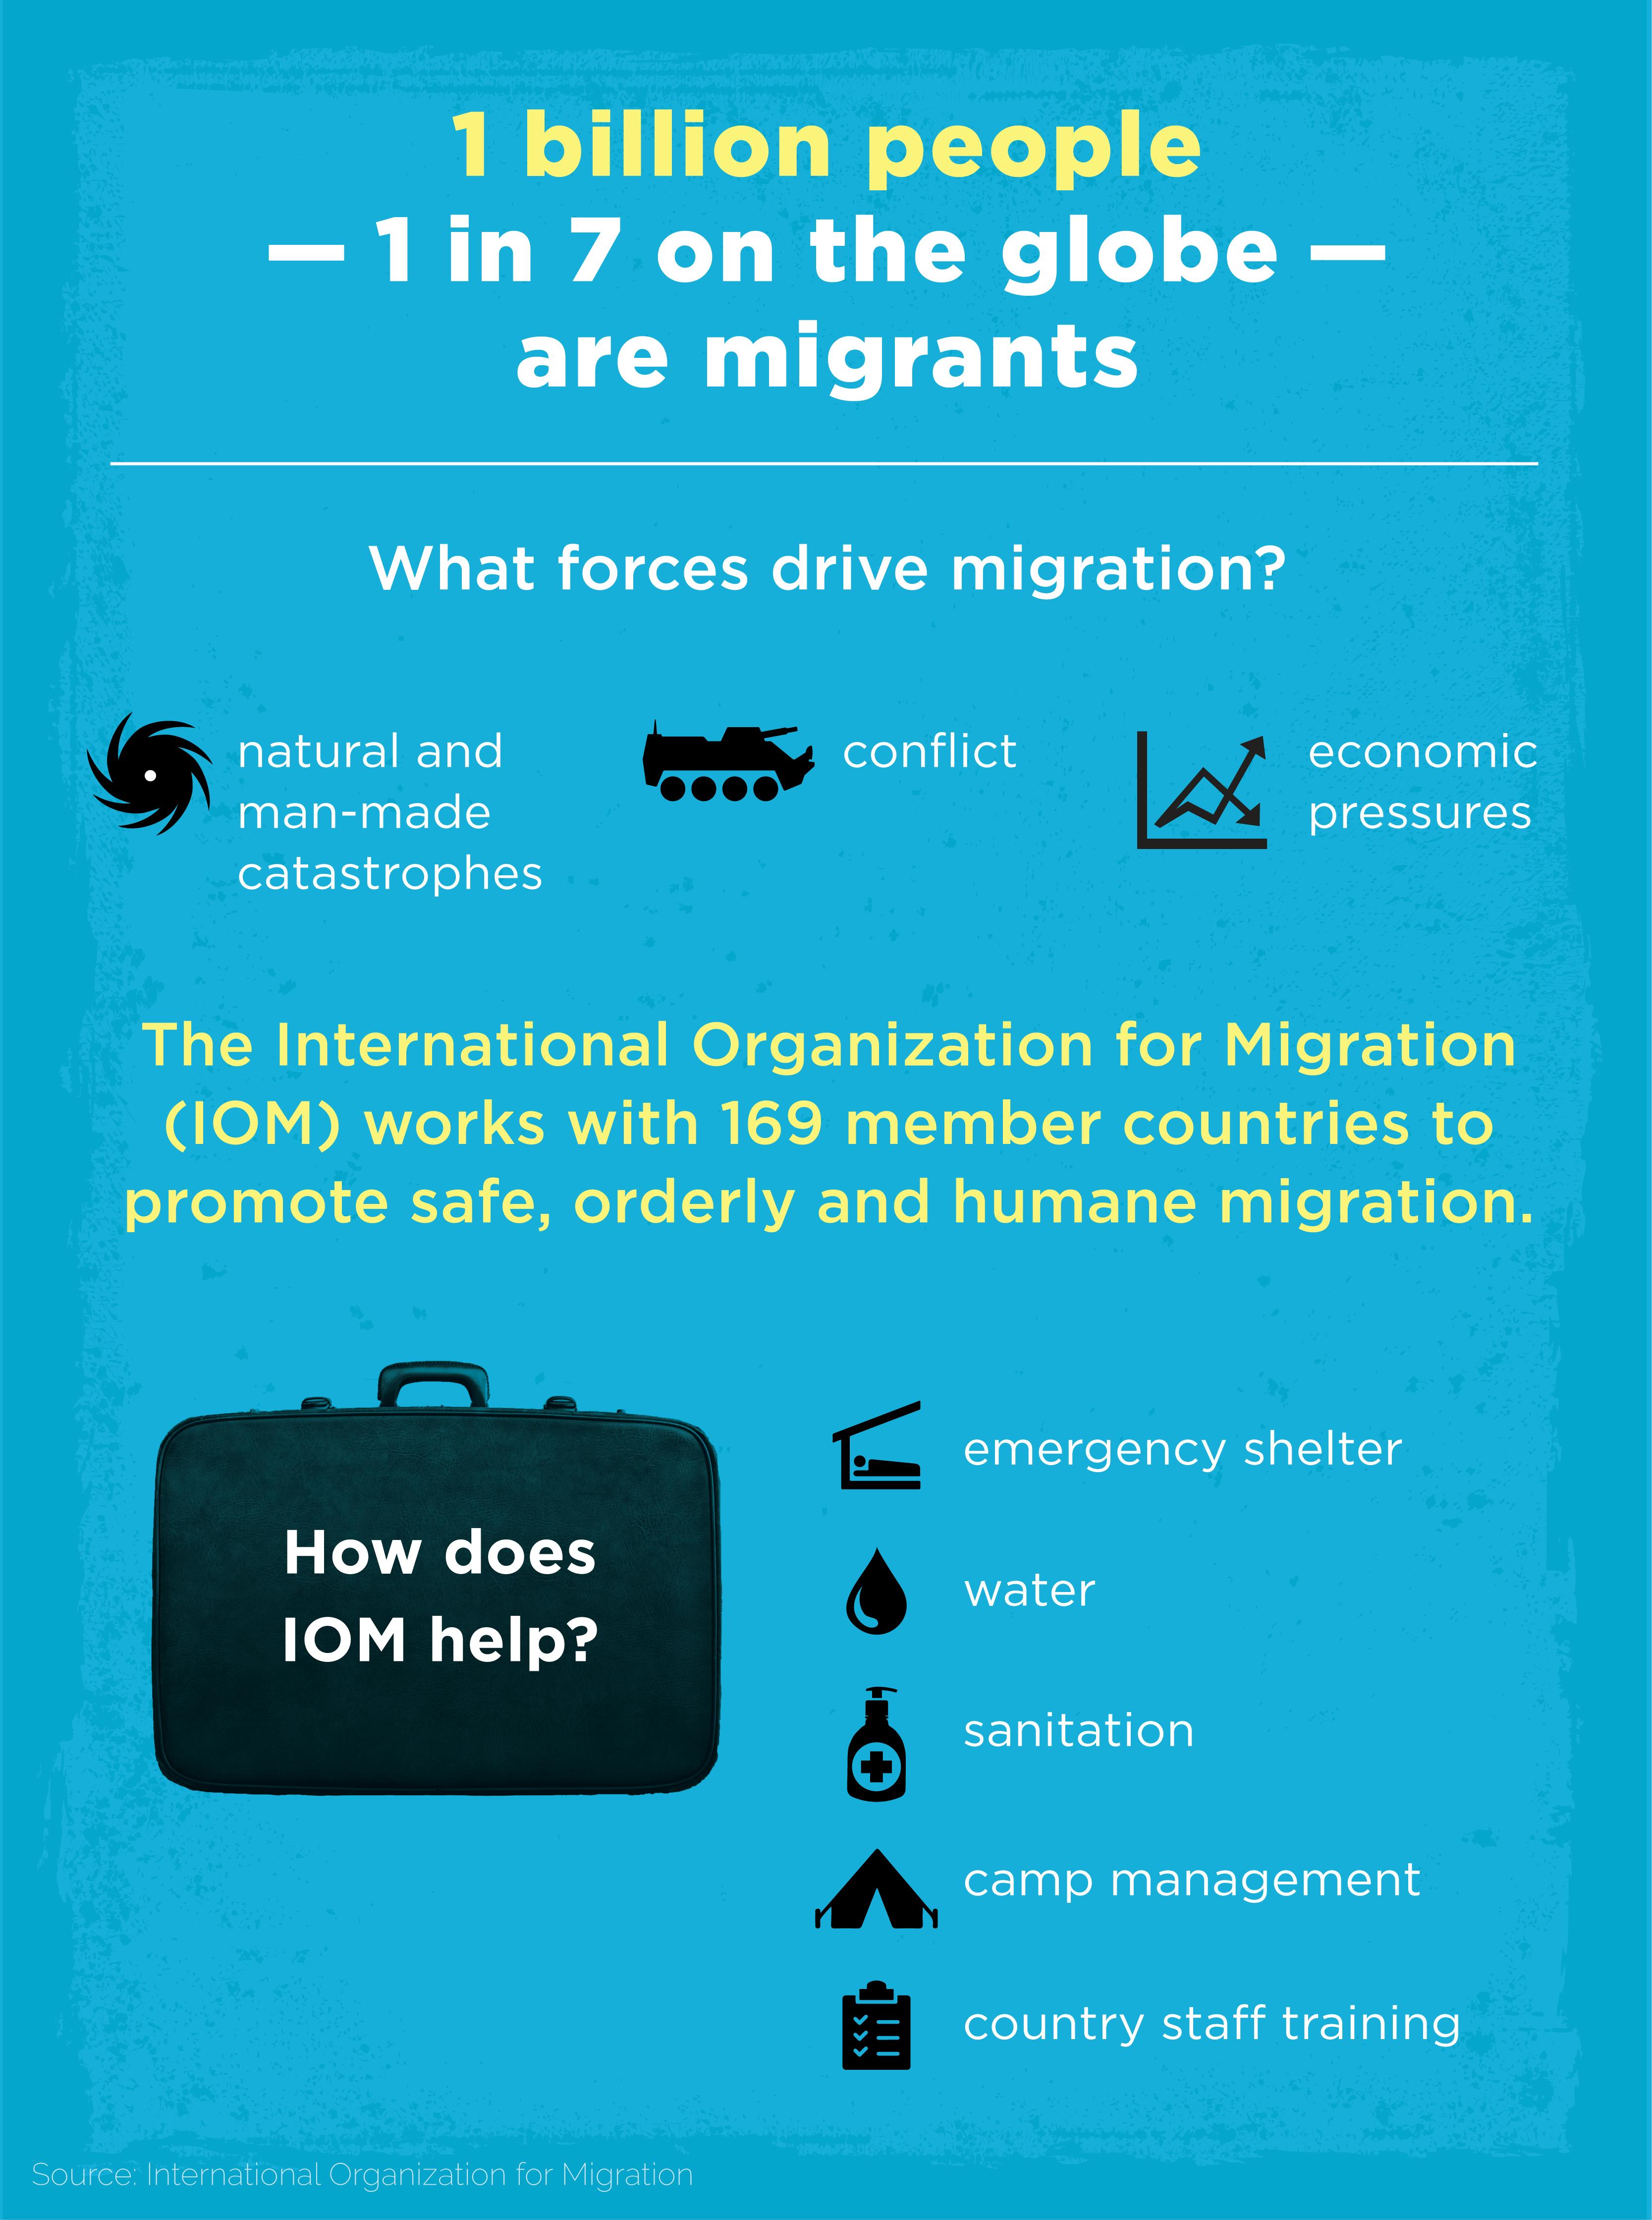 Chart describing how IOM promotes safe, orderly and humane migration (State Dept./J. Maruszewski)